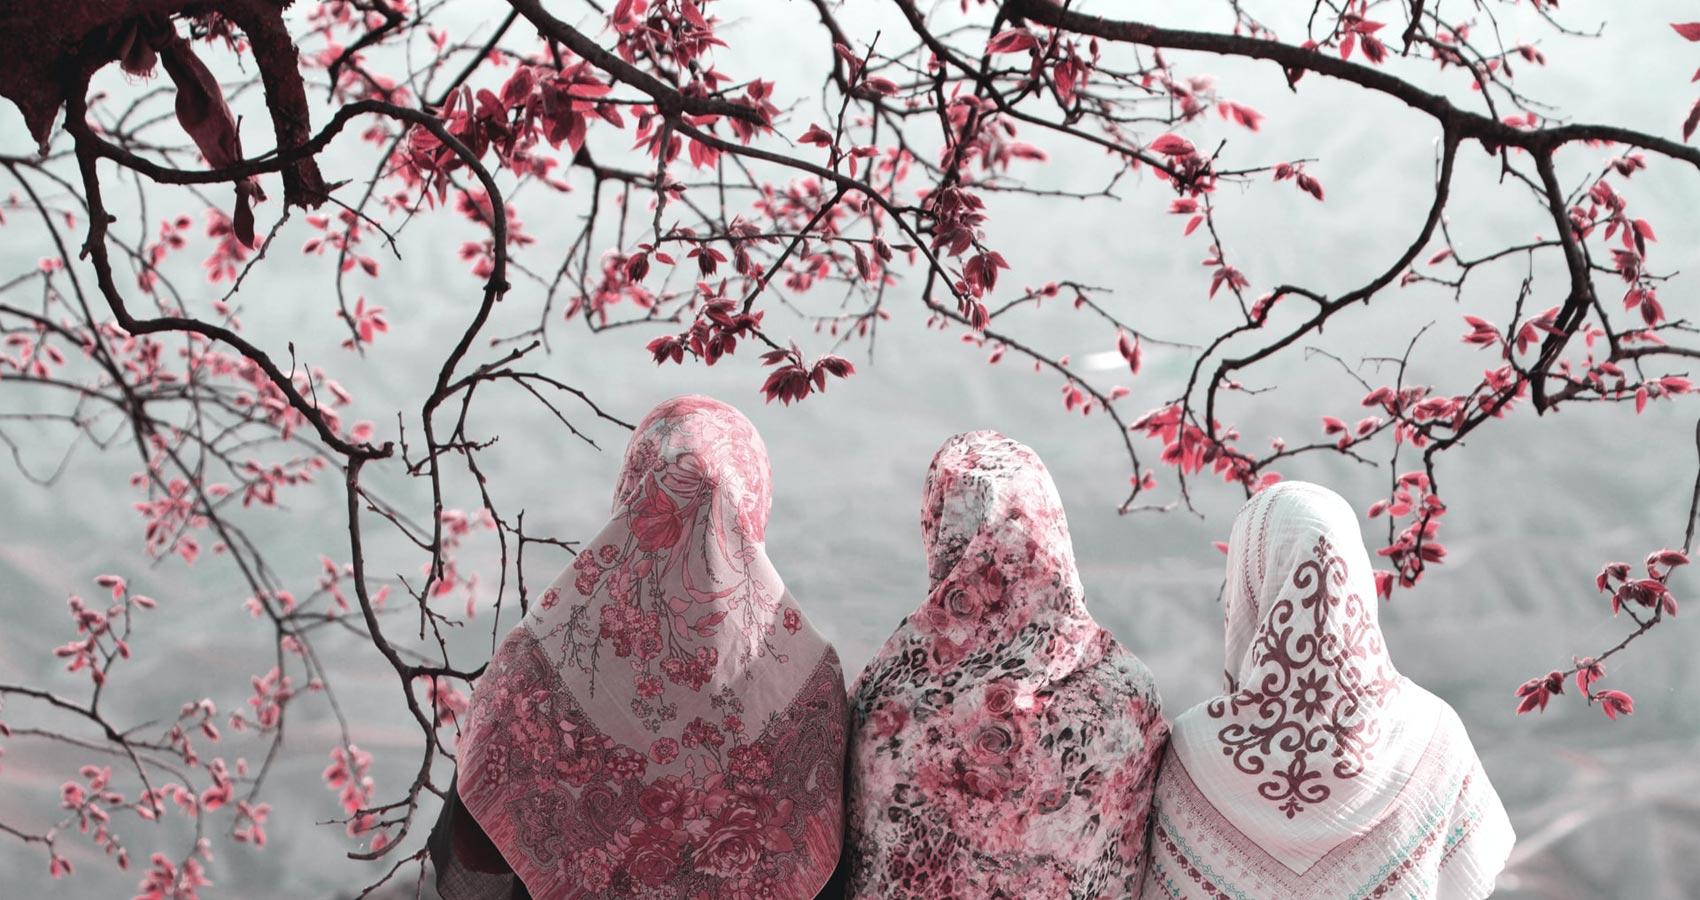 The Lightness of Ramadan, a poem by Karima Hoisan at Spillwords.com